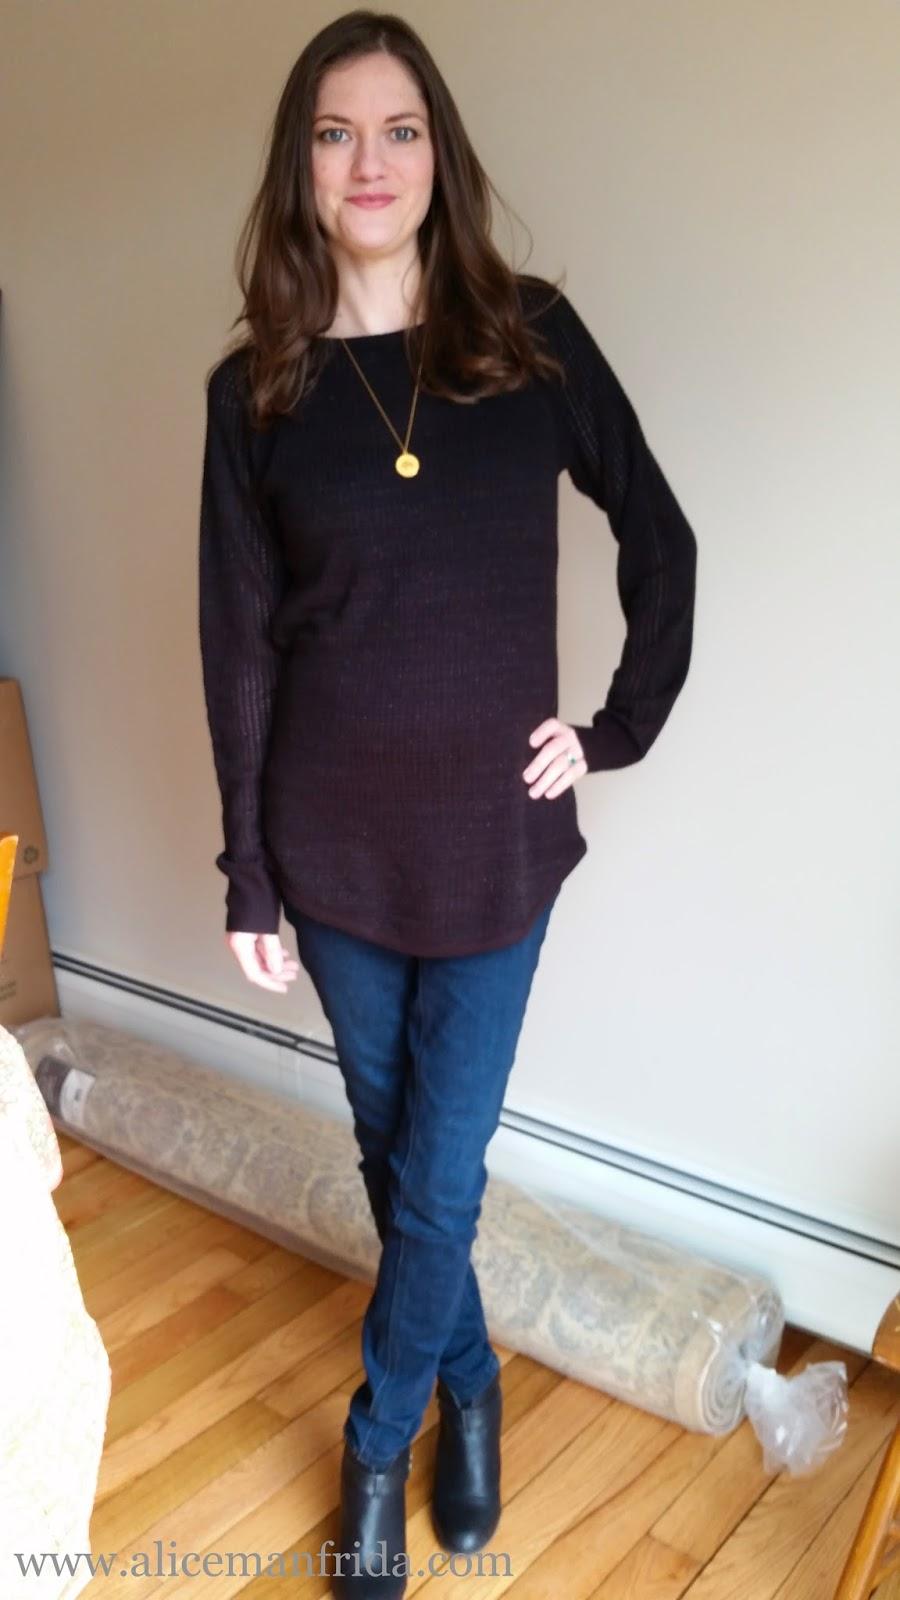 1fba5692f404f Alice Manfrida: Maternity Style: Sweater & Jeans